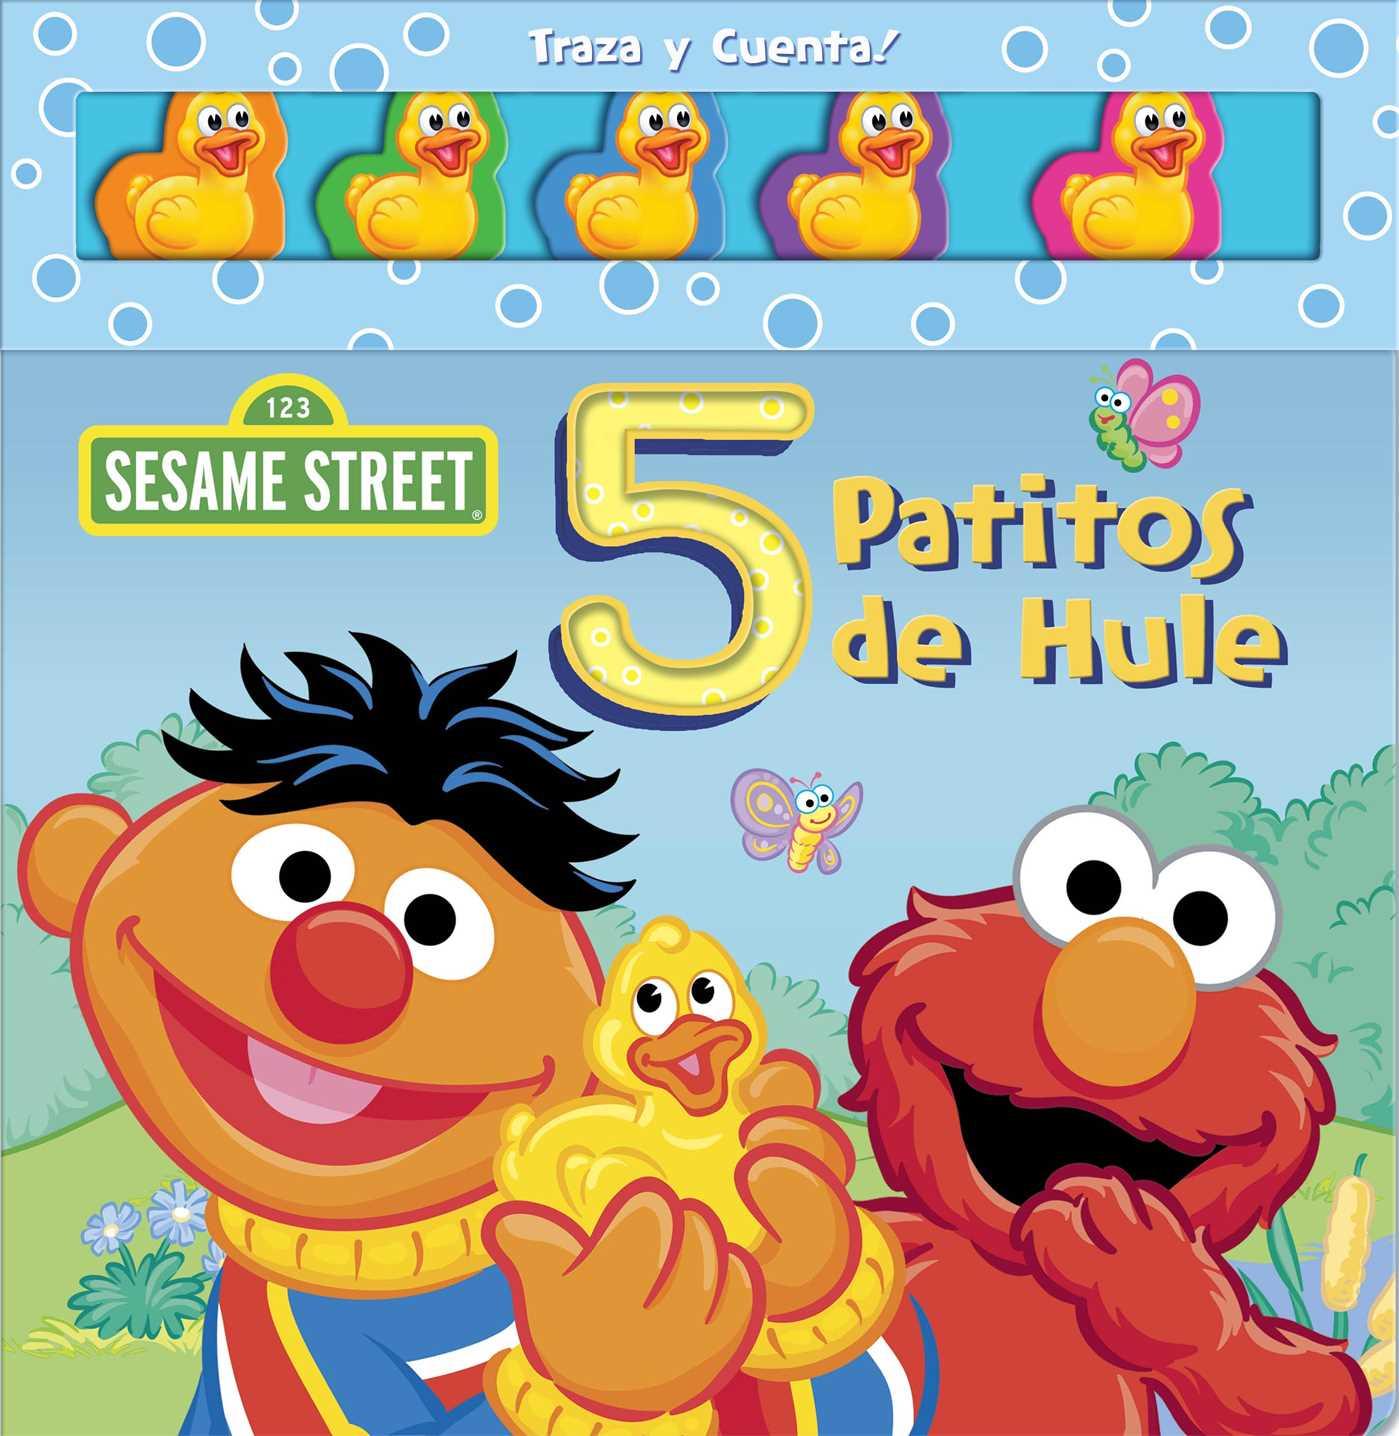 sesame street 5 patitos de hule book by matt mitter tom brannon